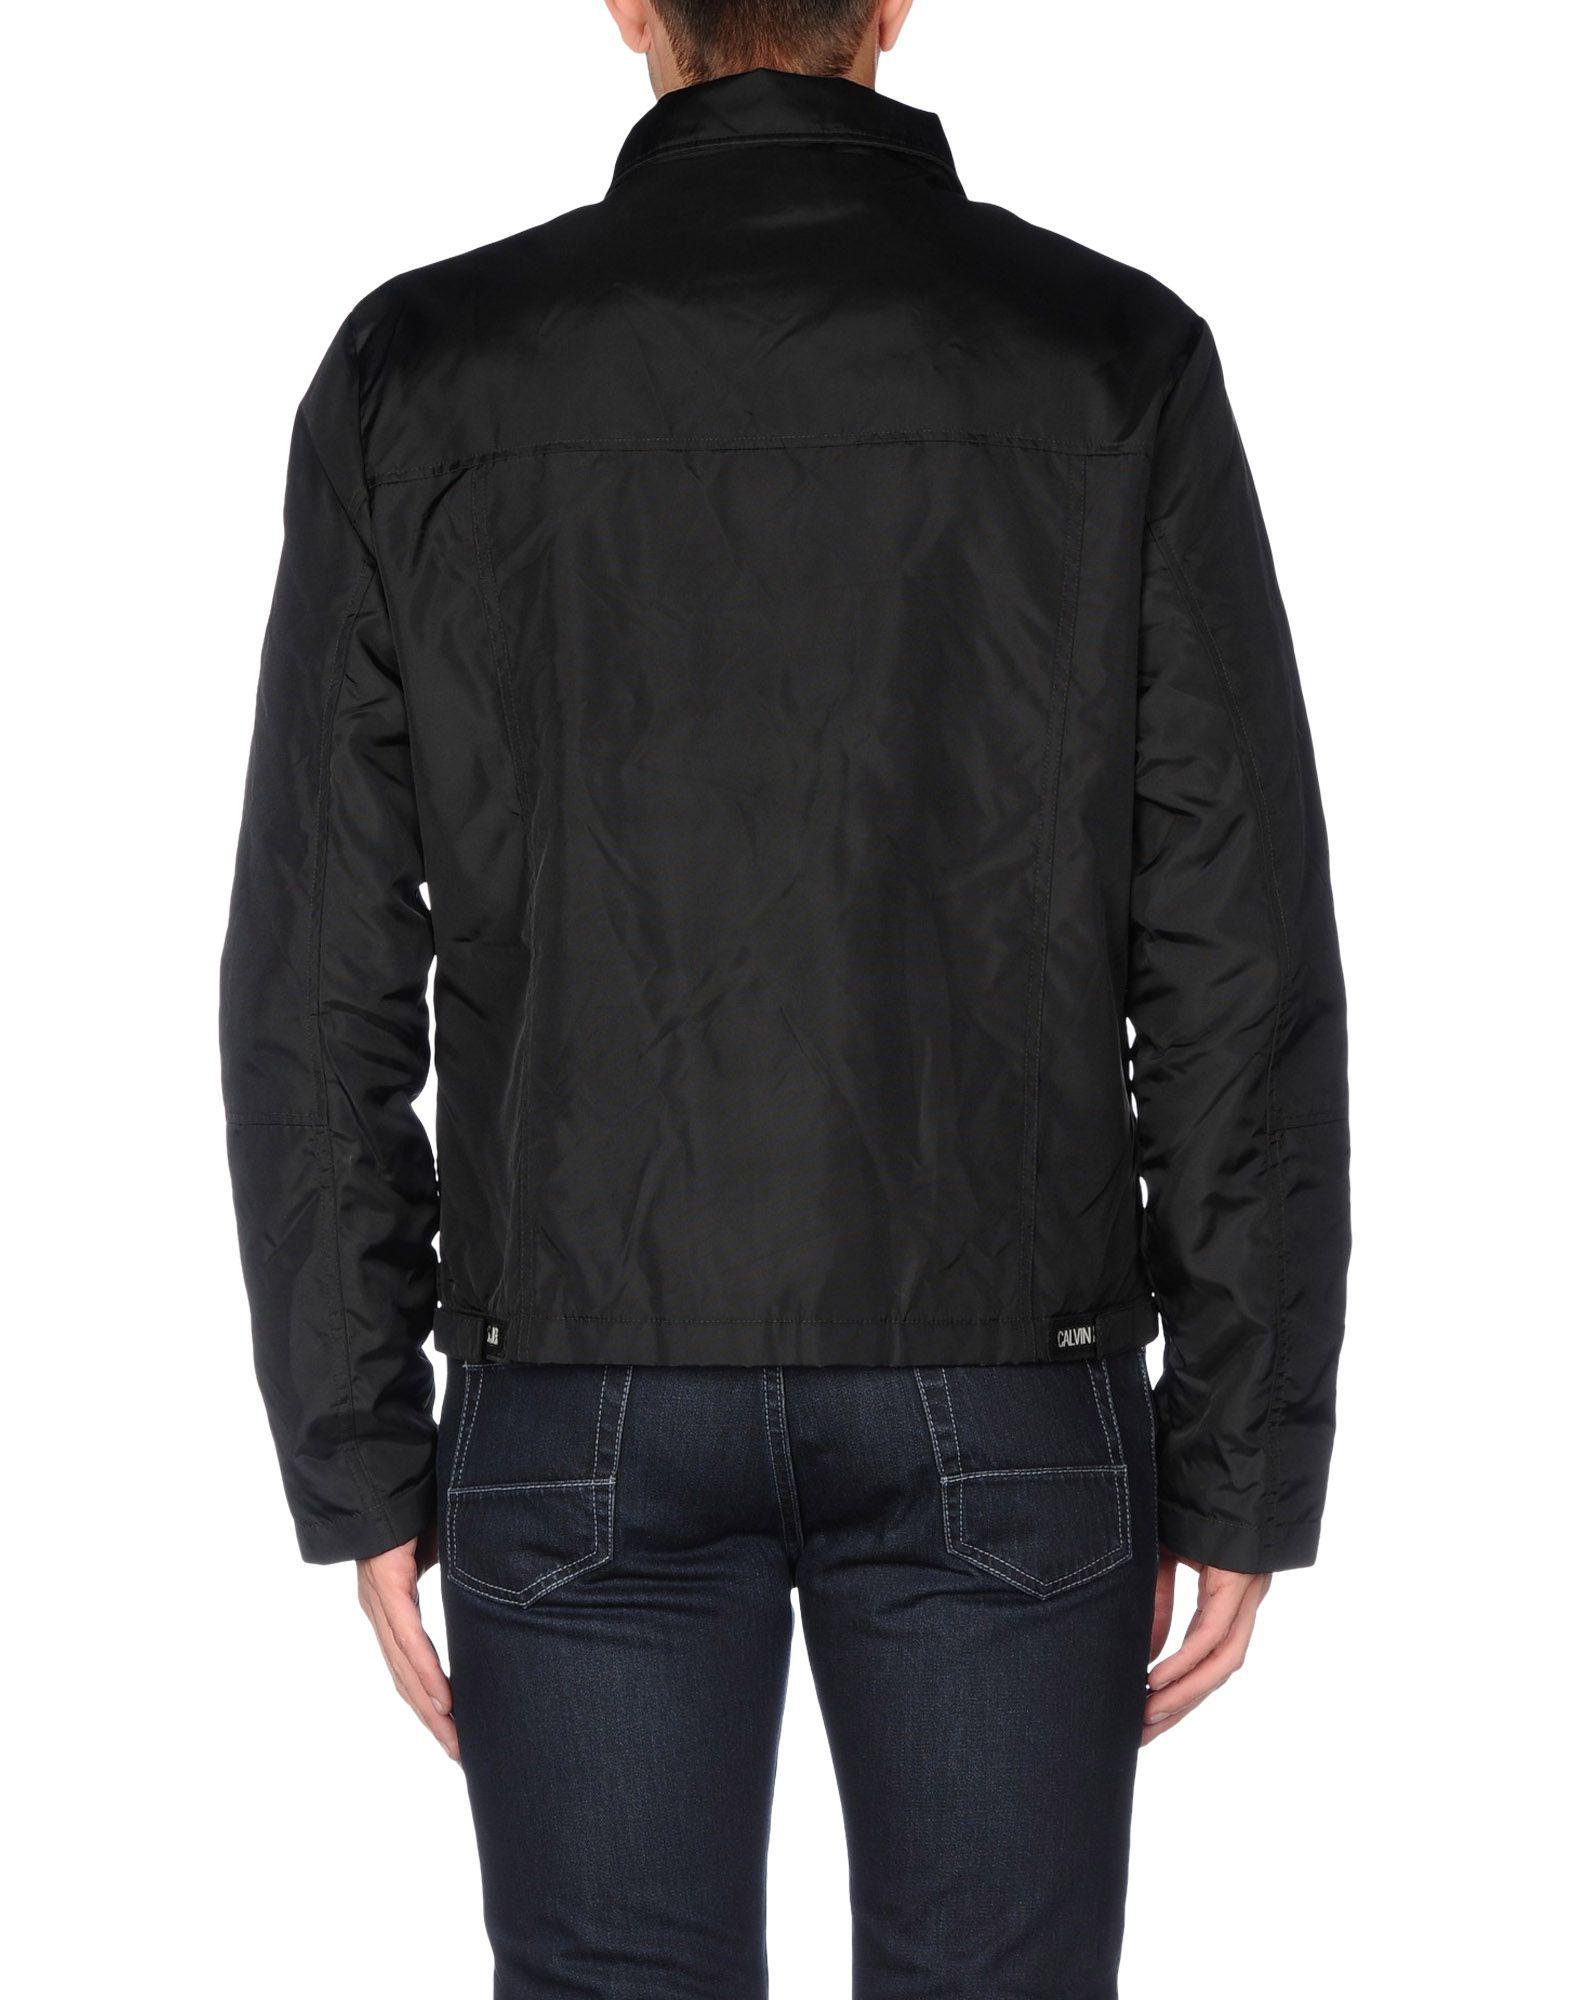 Calvin klein jeans Jacket in Black for Men | Lyst